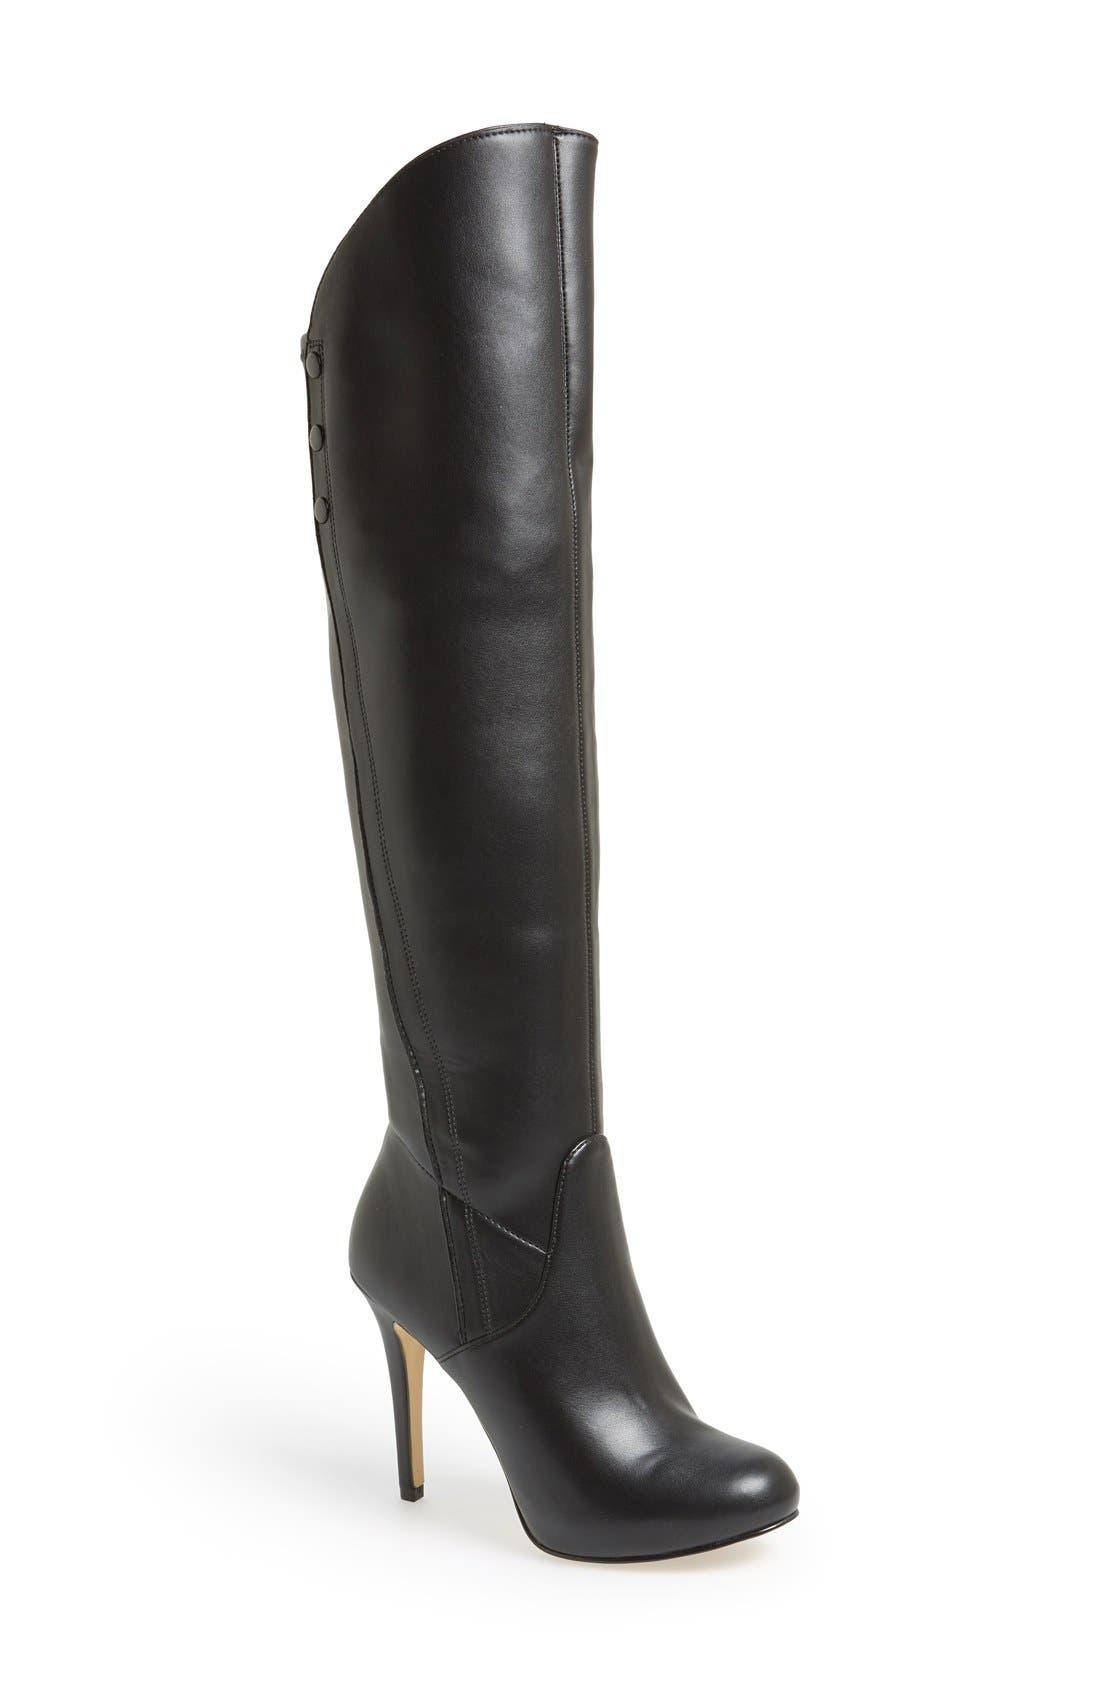 Main Image - Guess 'Enesta' Platform Over The Knee Boot (Women)